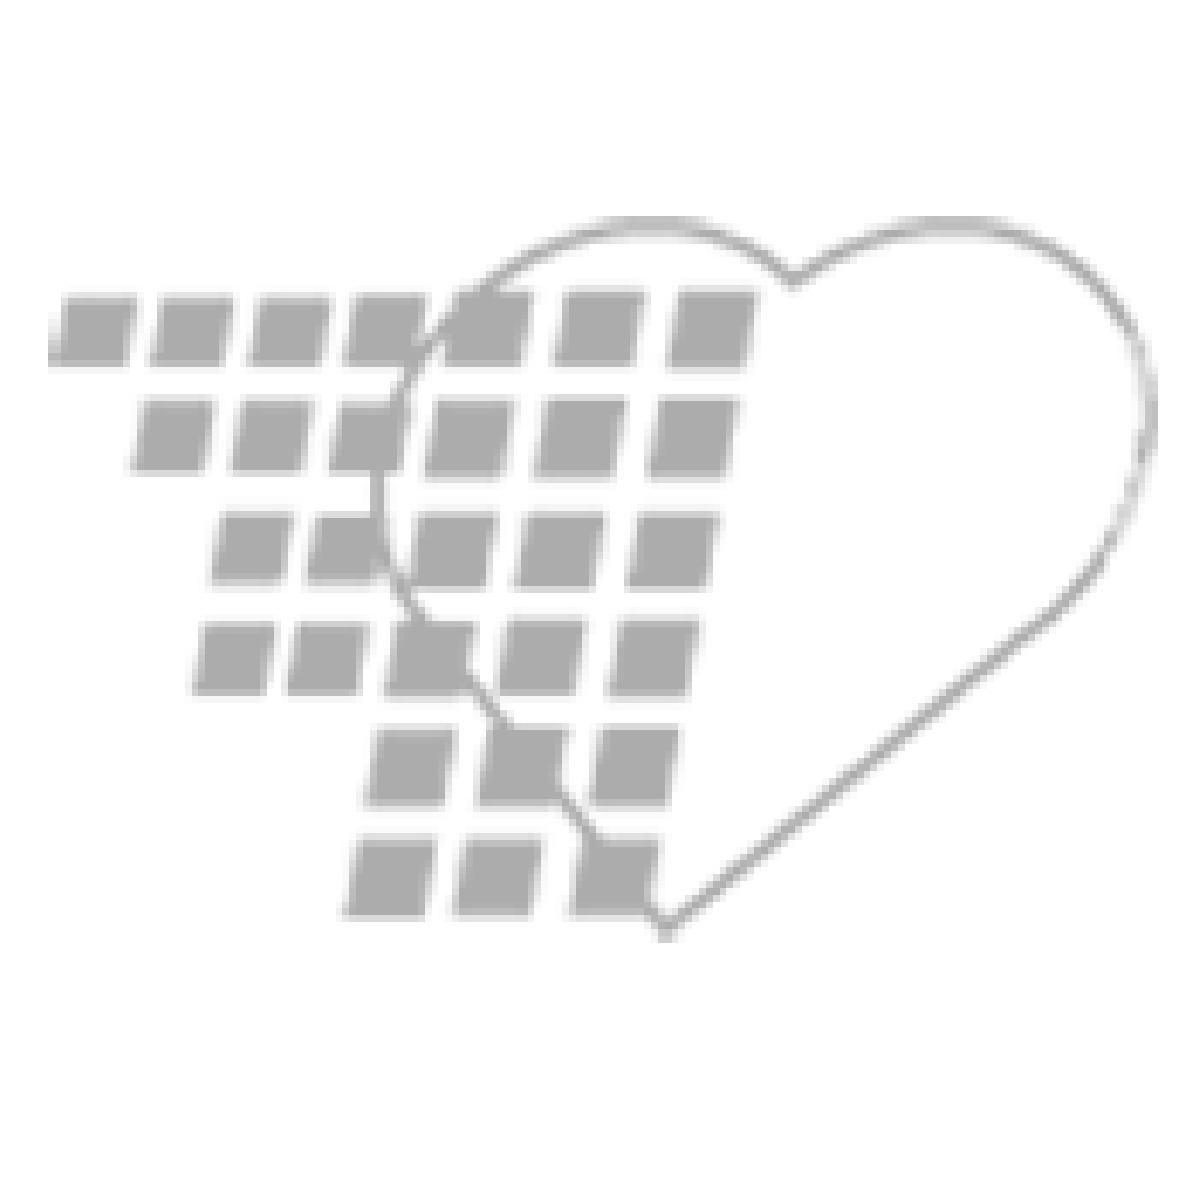 02-70-7330 Welch Allyn SofSeal Specula Tip for Ear Specula -Medium